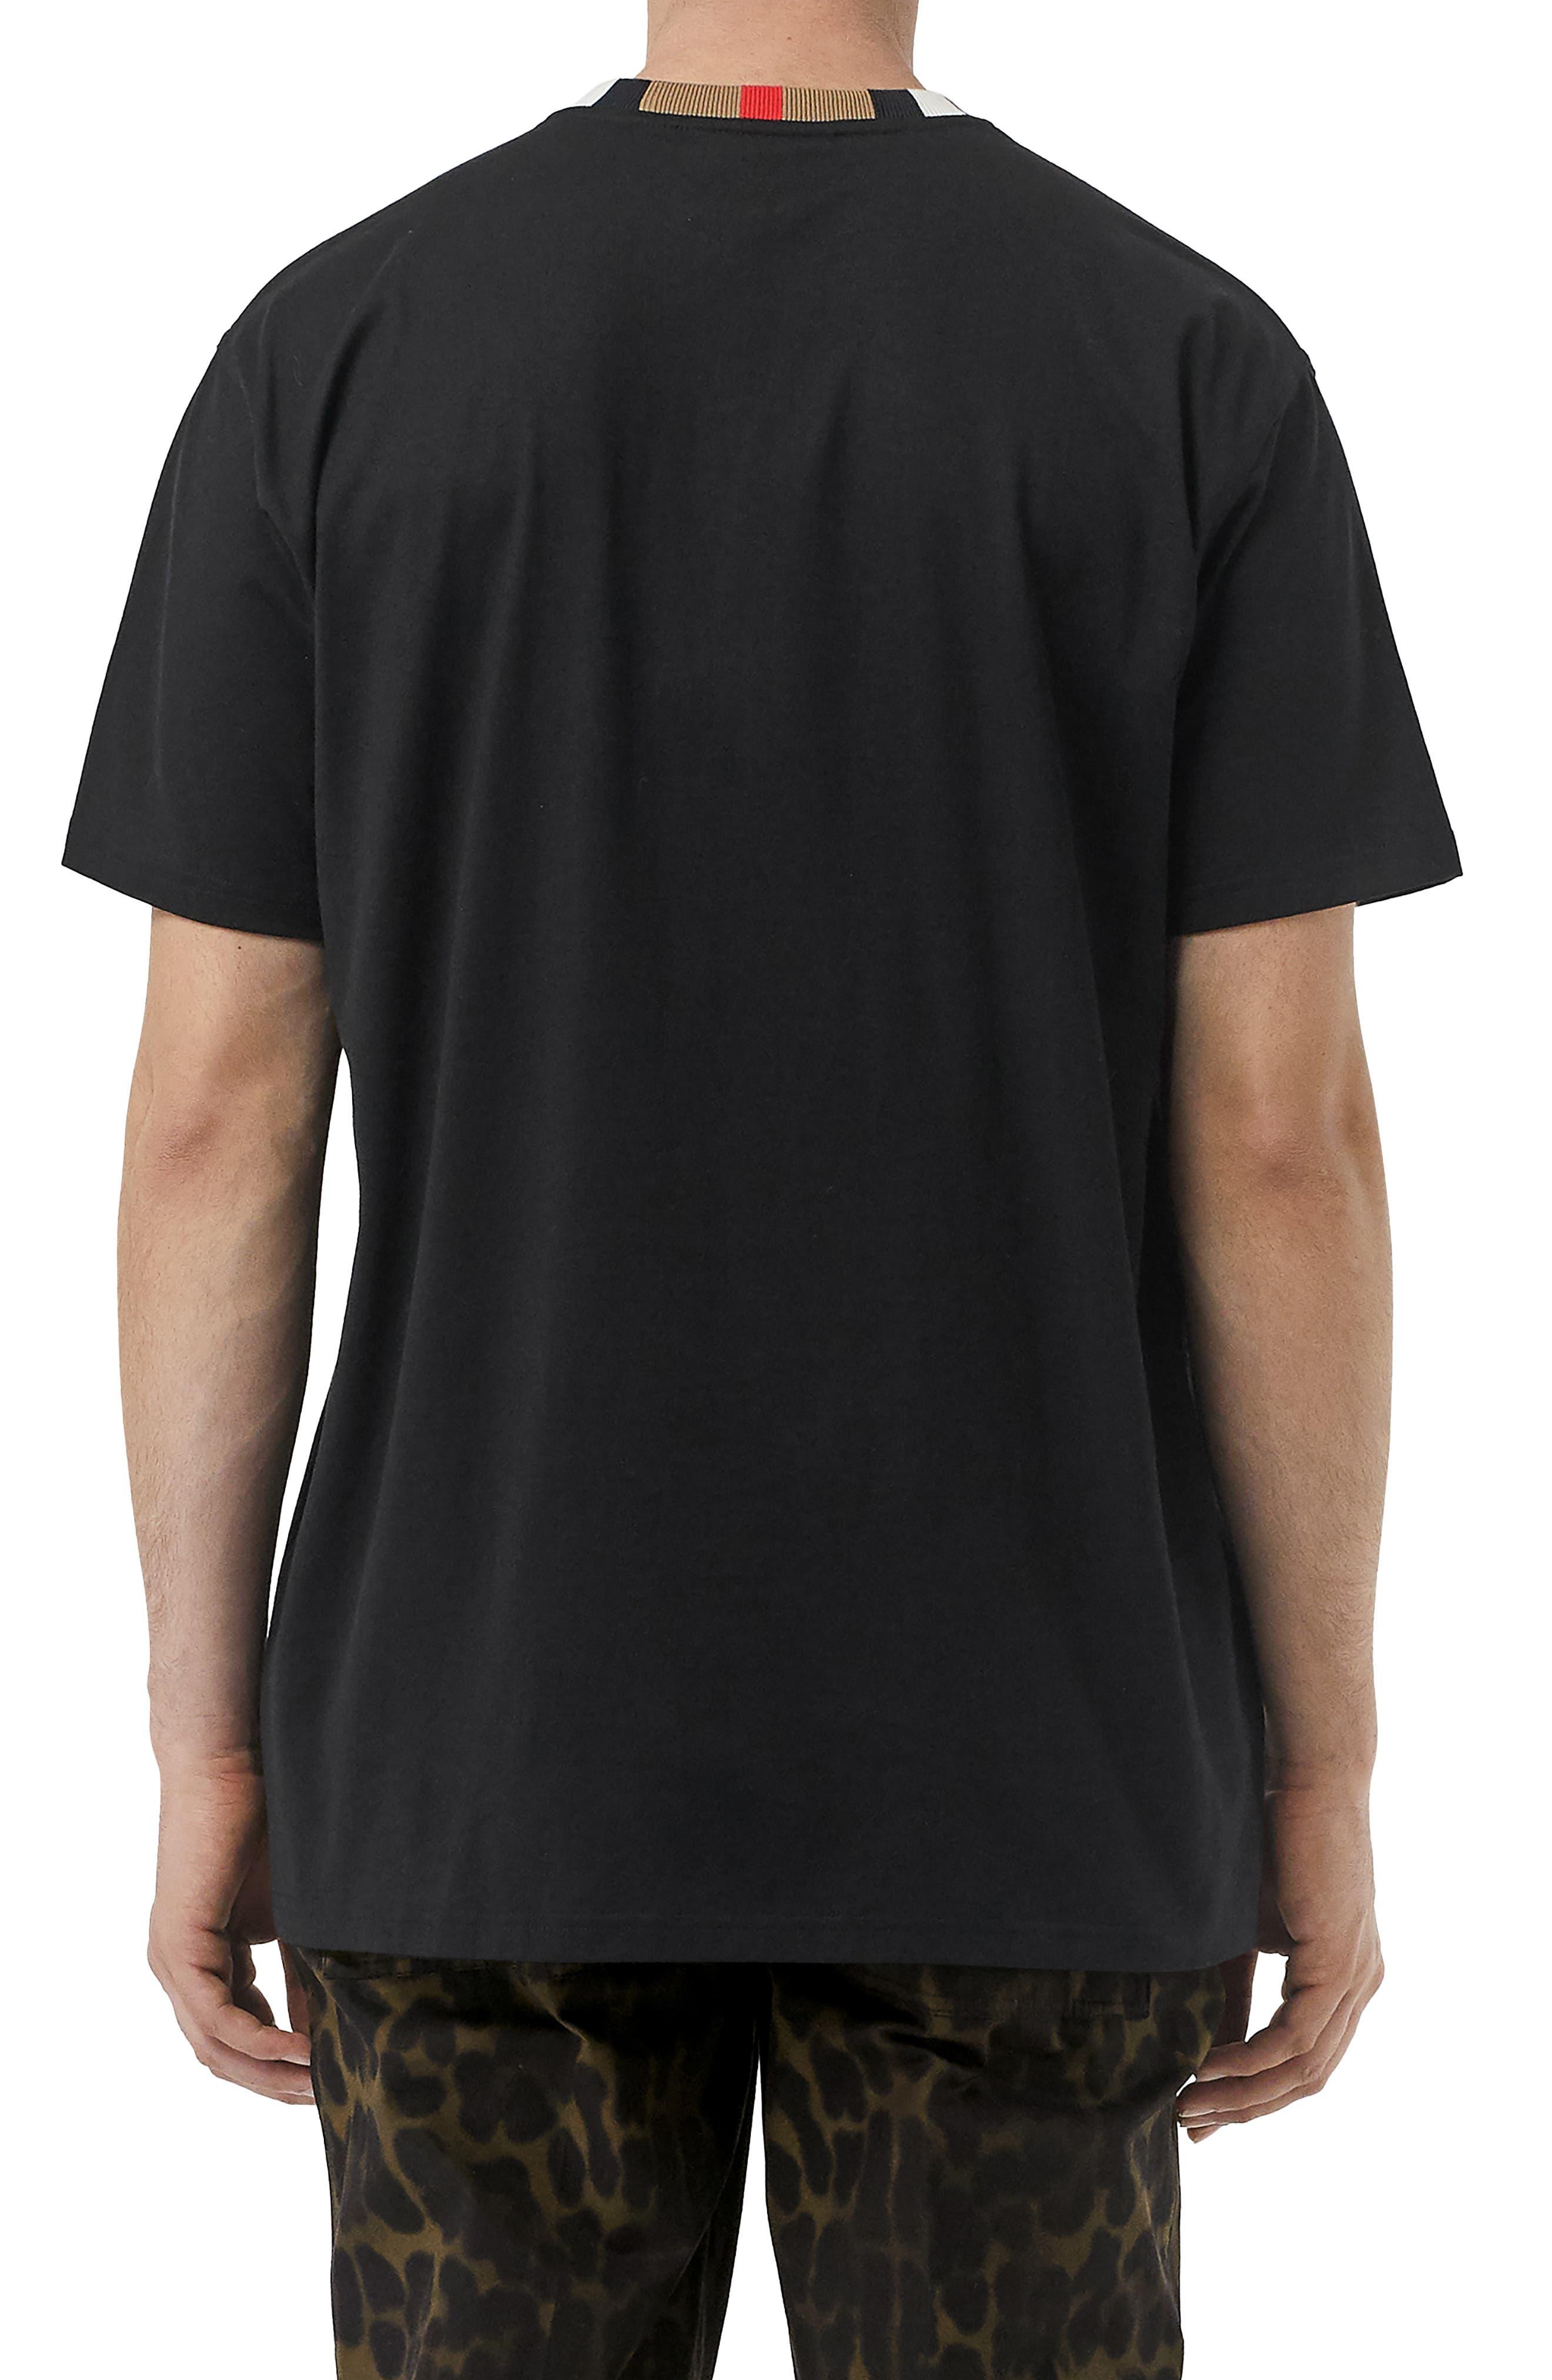 BURBERRY, Jayson Icon Stripe T-Shirt, Alternate thumbnail 2, color, BLACK